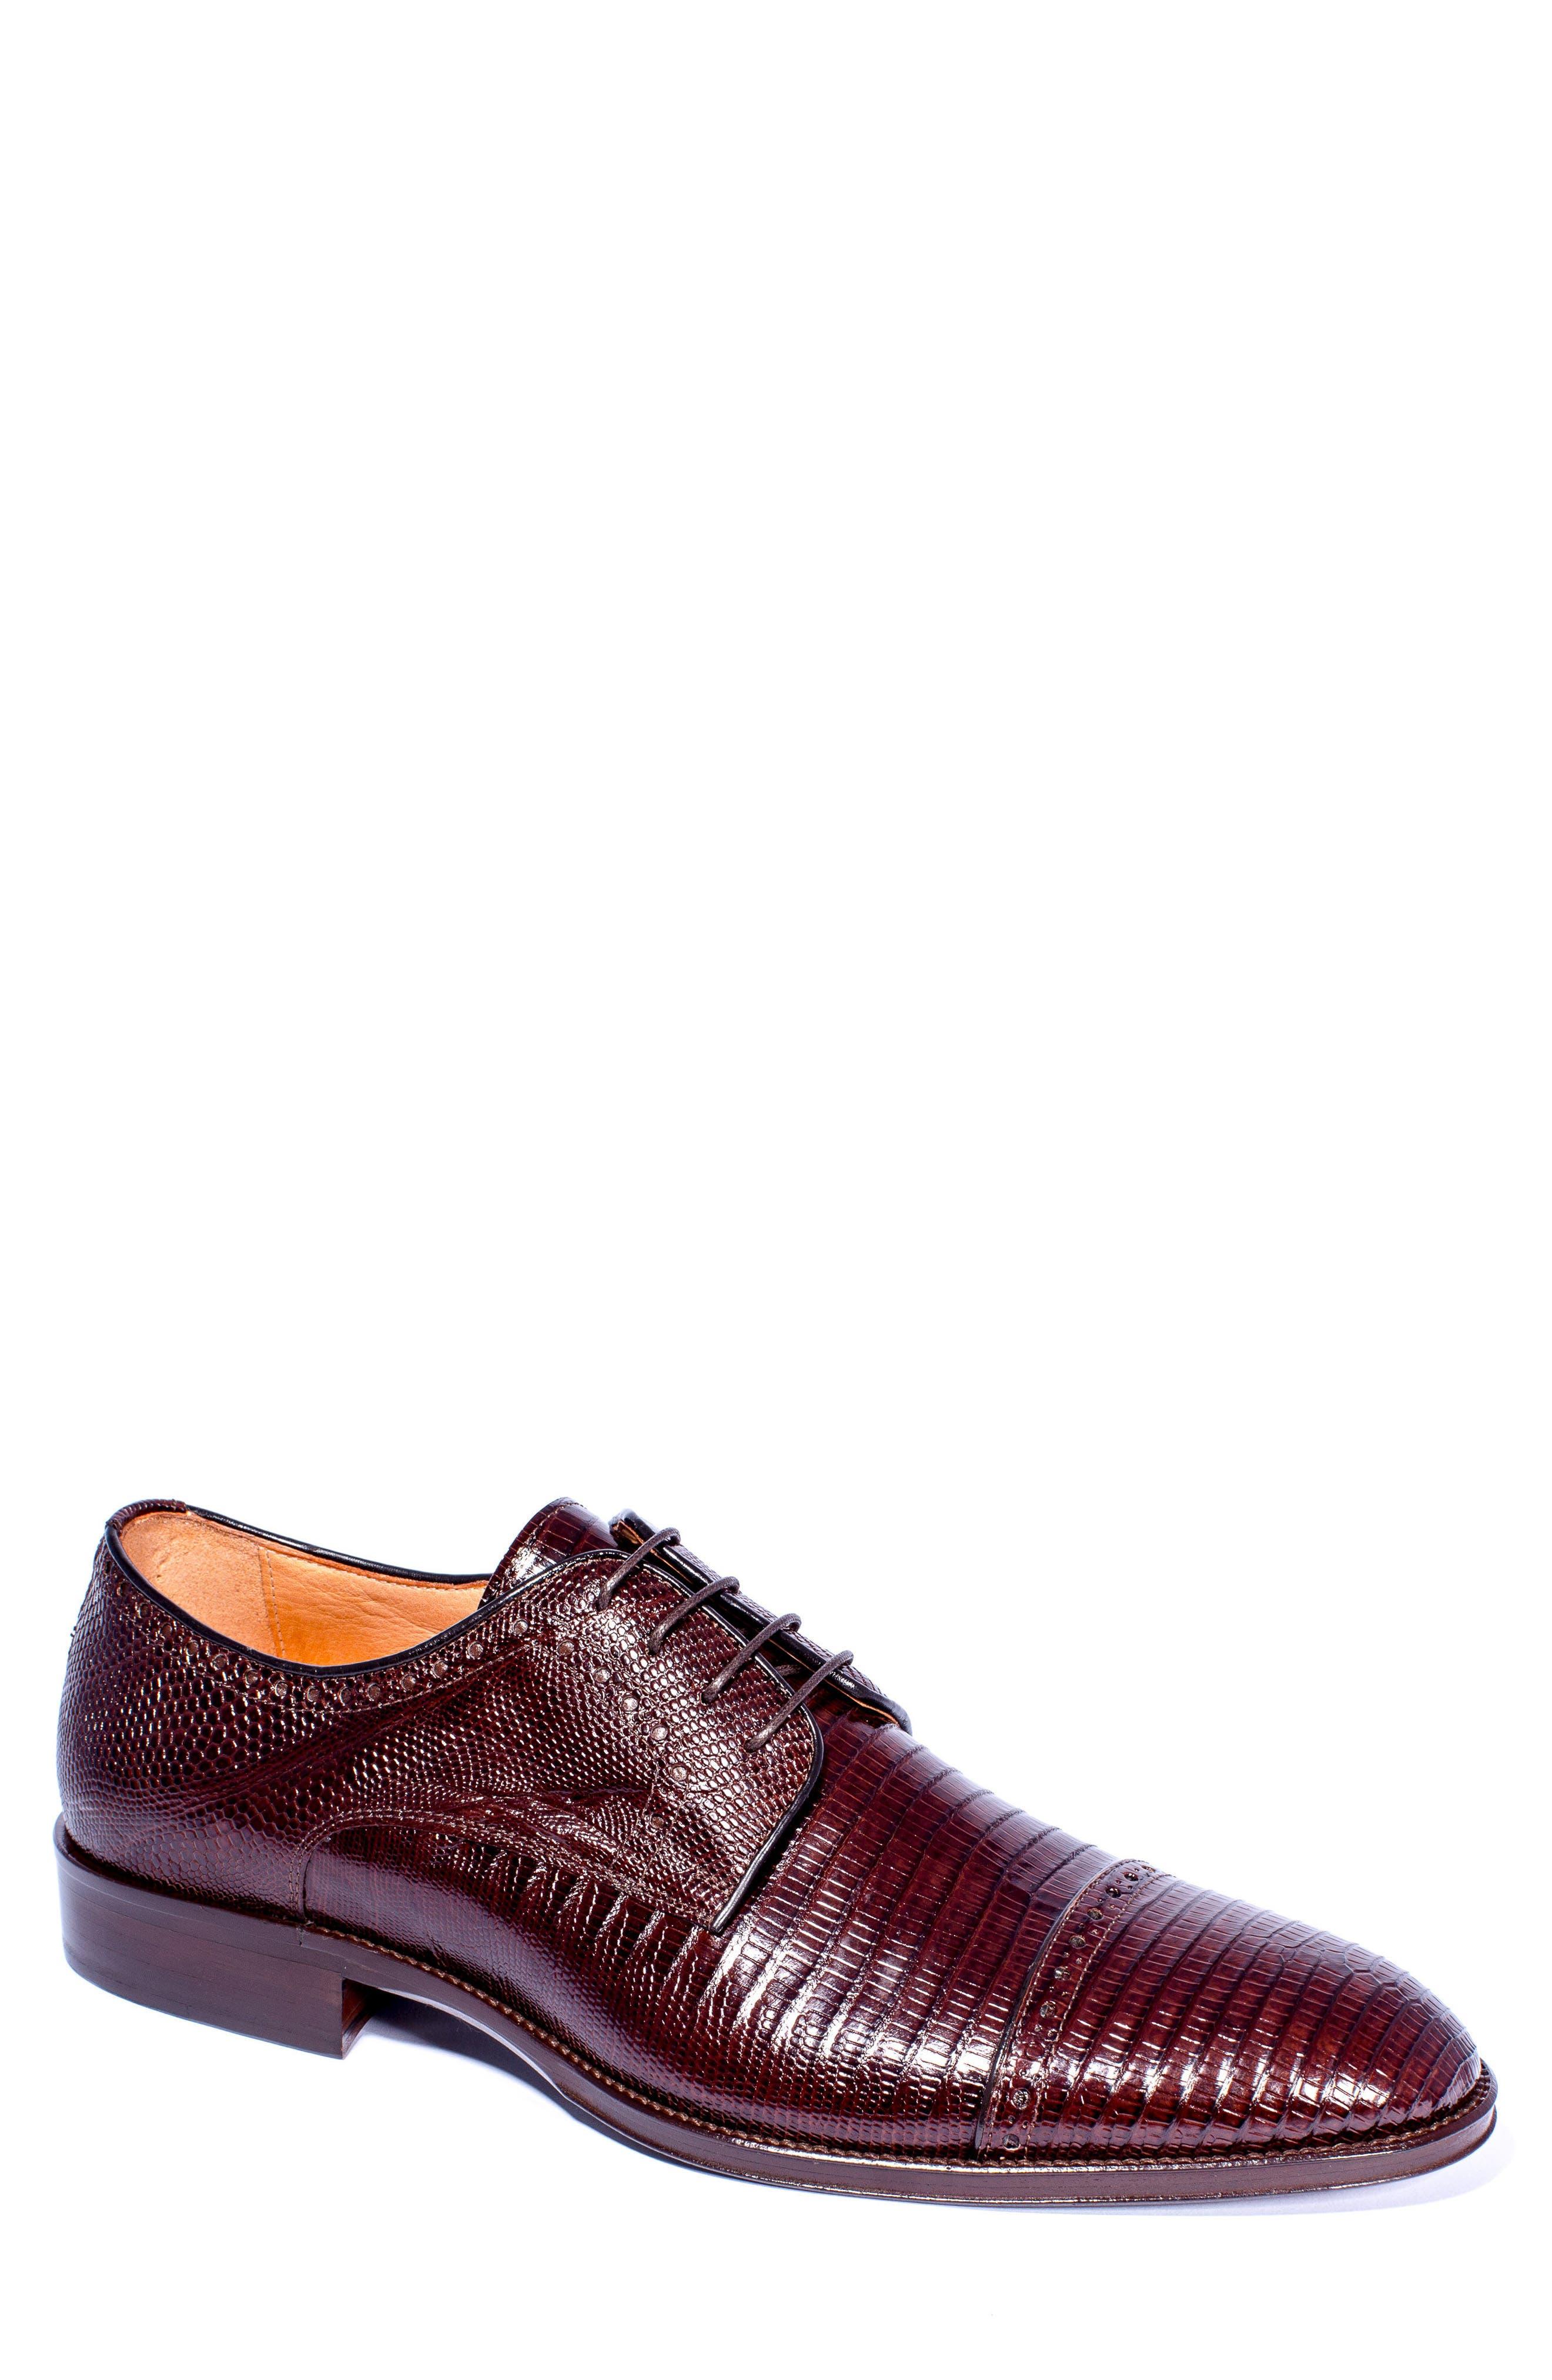 Giovanni Cap Toe Derby,                         Main,                         color, Brown